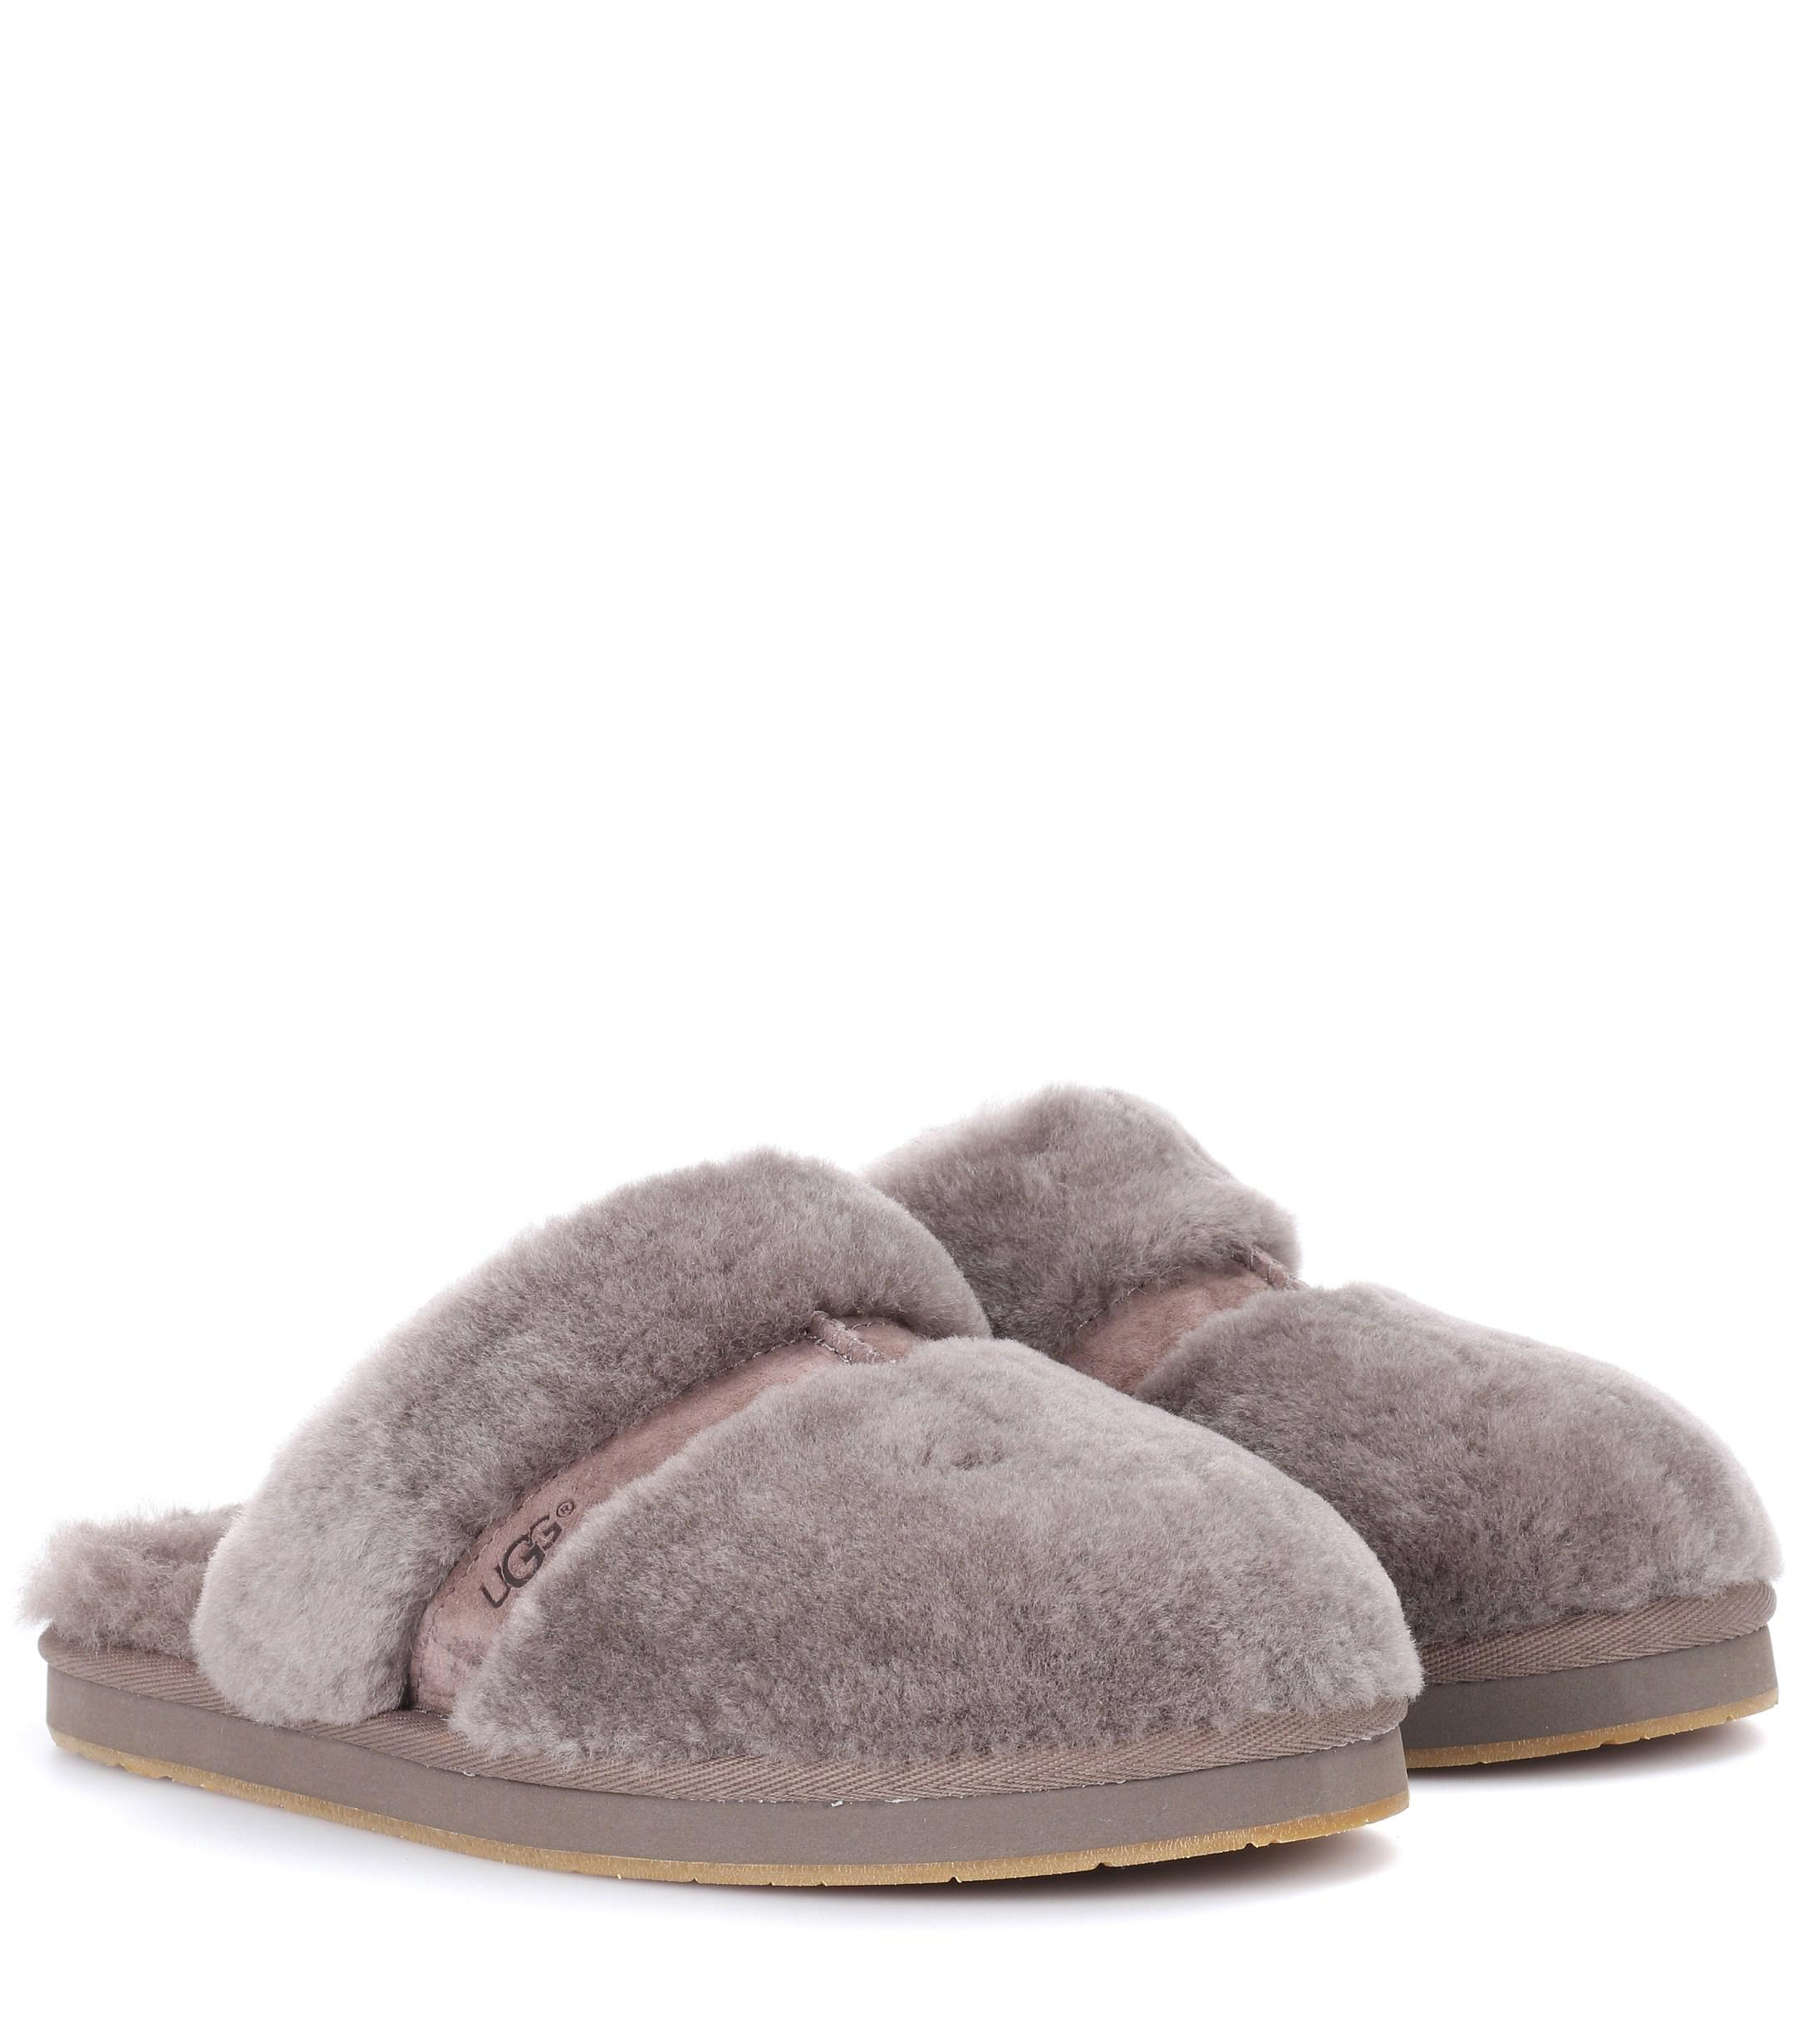 d0837bf31e6 UGG Dalla Fur Slippers in Brown - Lyst